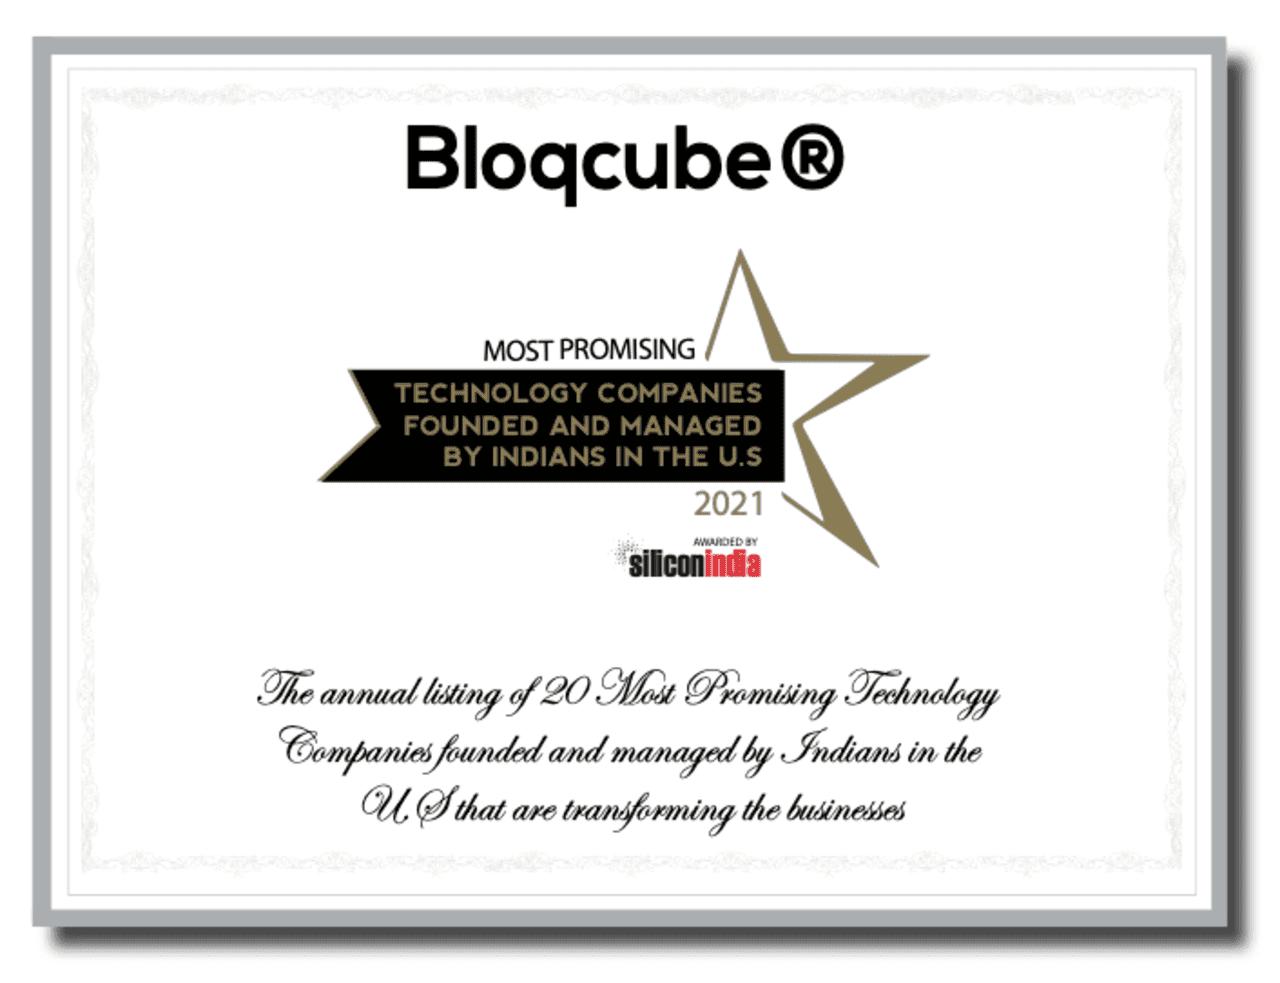 Bloqcube® Facilitating Decentralized Clinical Trials via Blockchain Technology